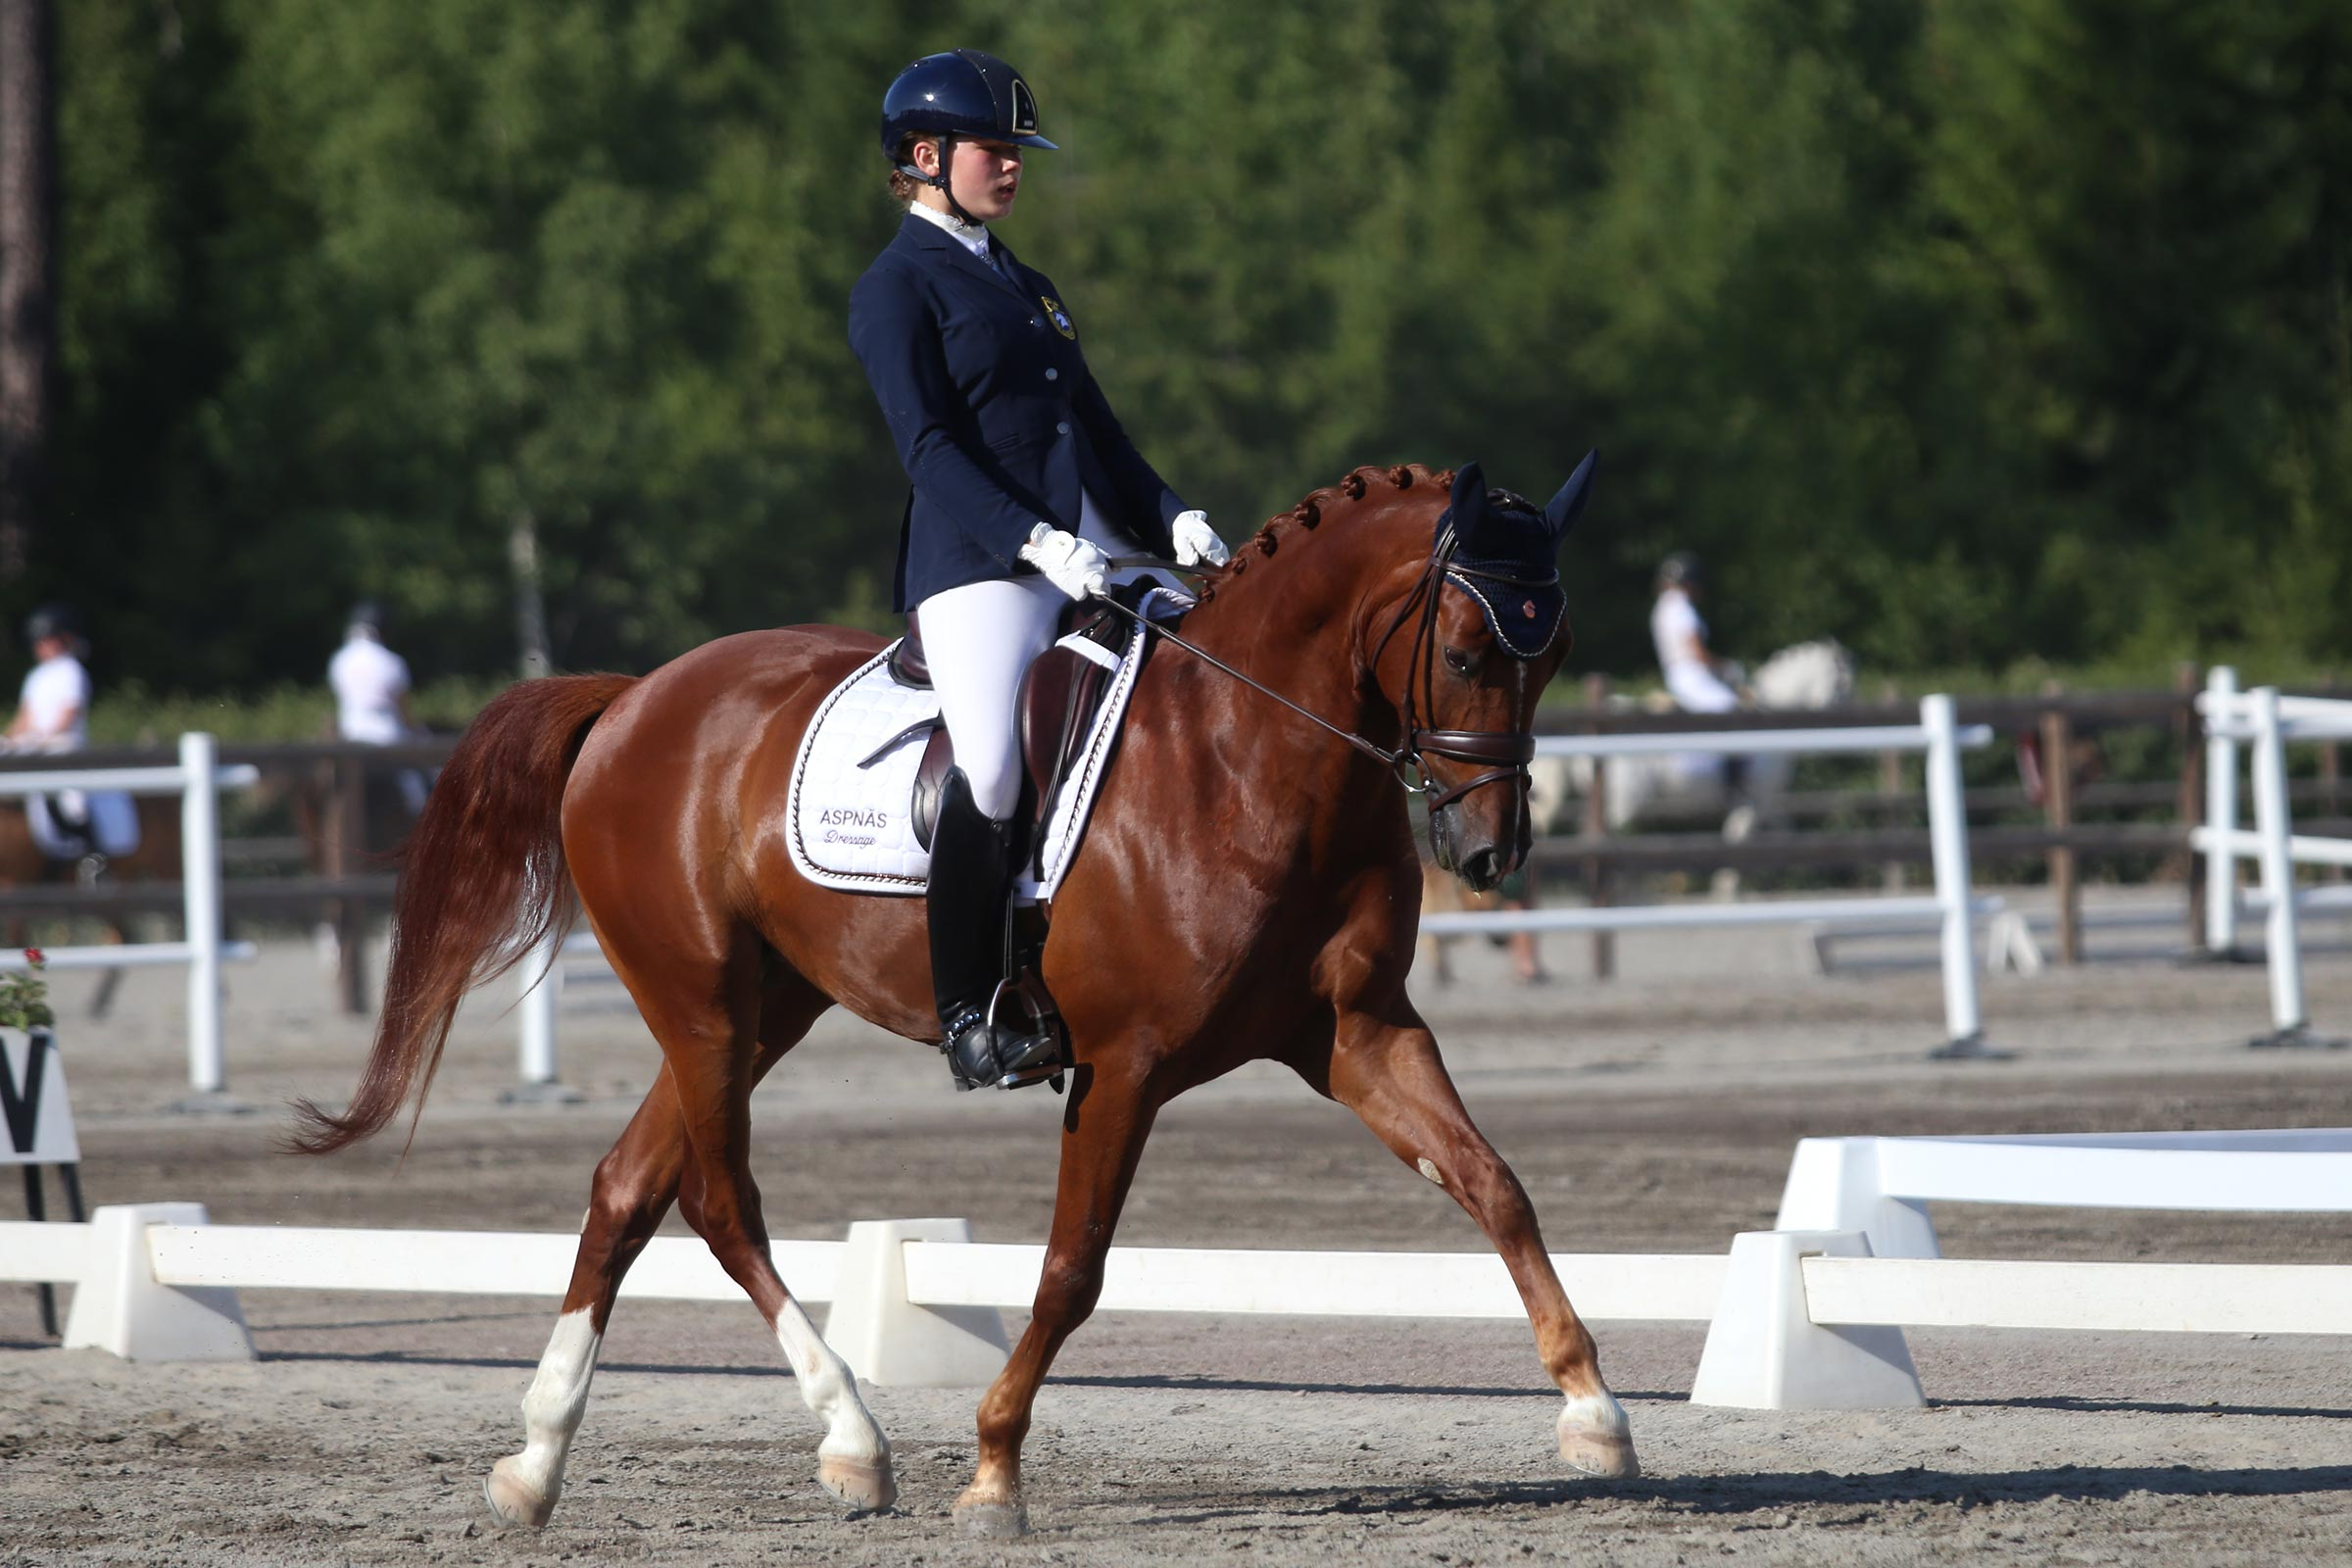 Guld: Moa Sundelöf - Camino Royal (WESTF val f-13 e FS Cracker Jack-Courage, uppf Bernhard Jensen) 167,600